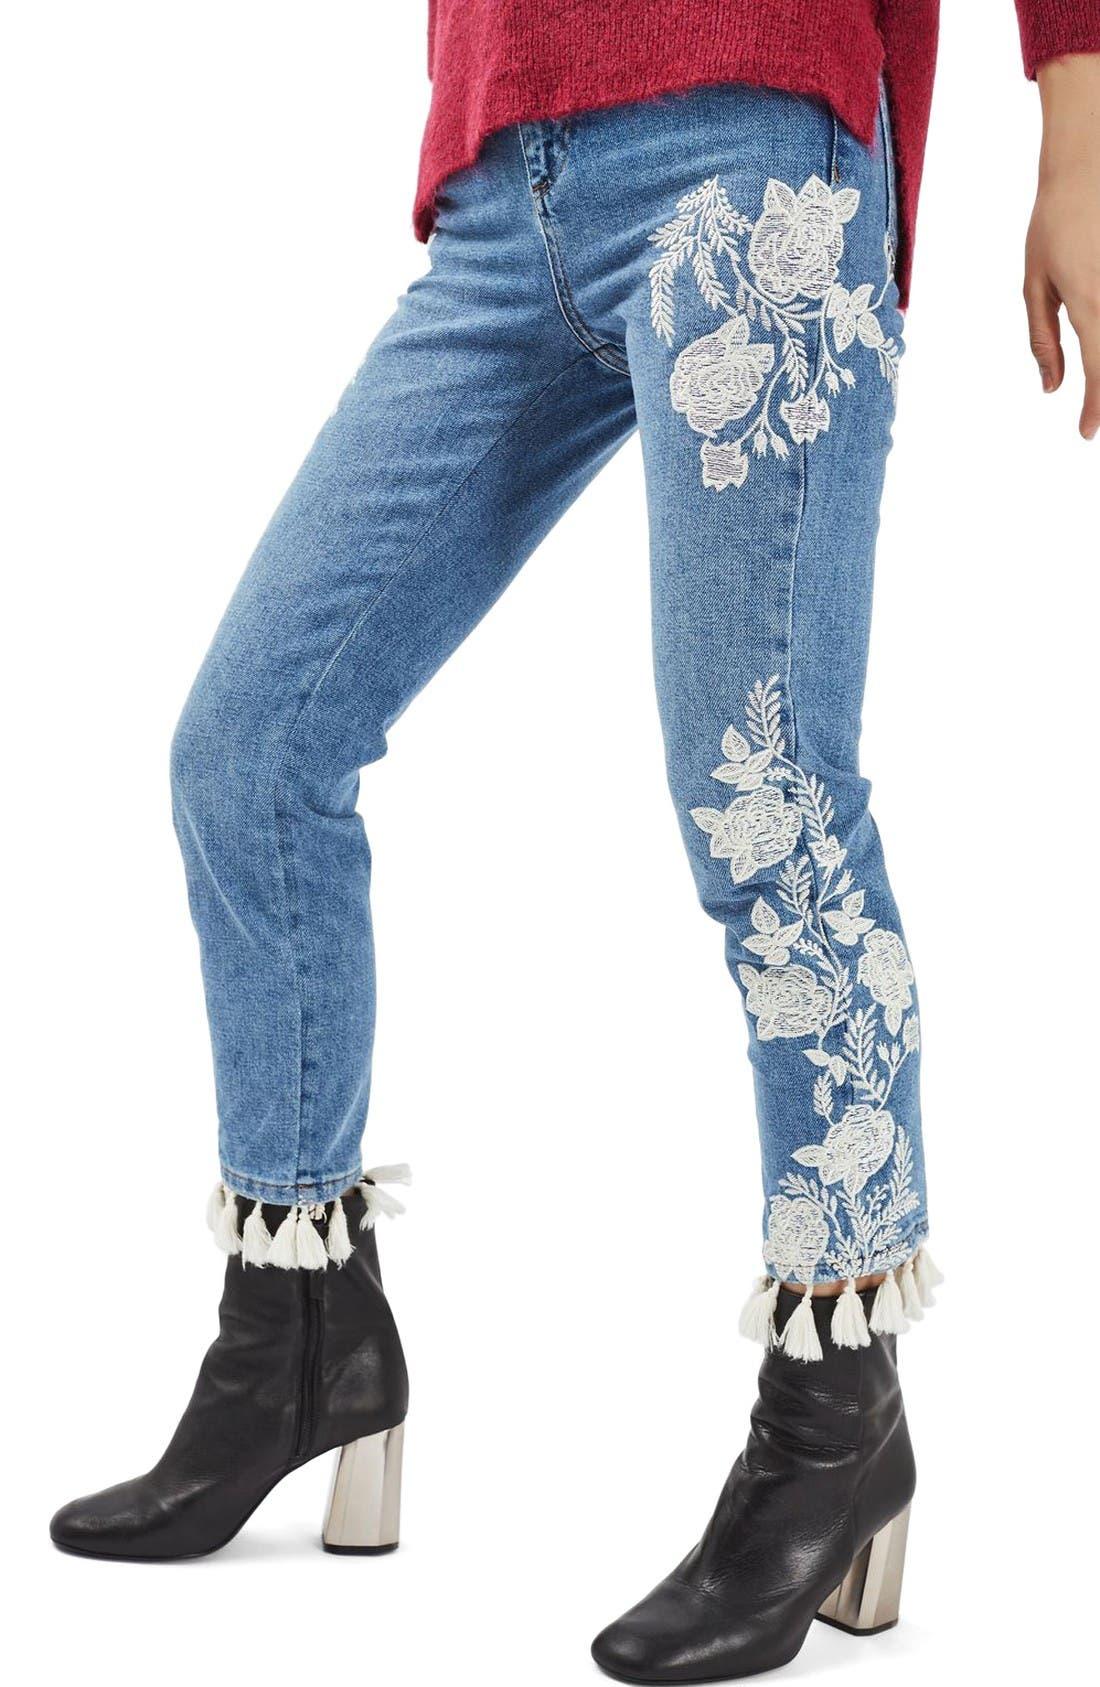 34 Inseam Jeans For Women